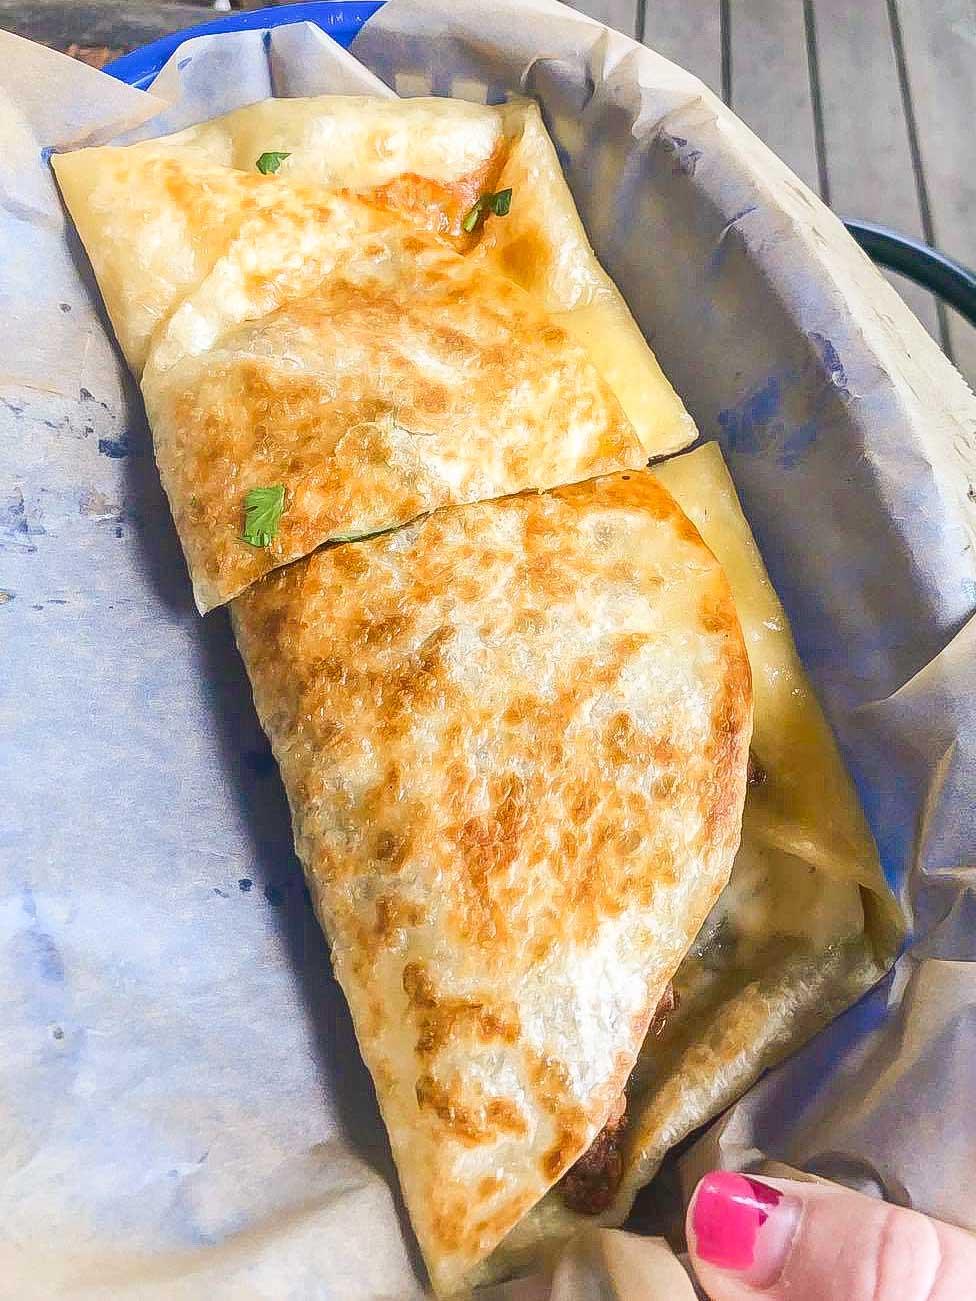 Chicken quesadilla cut in half